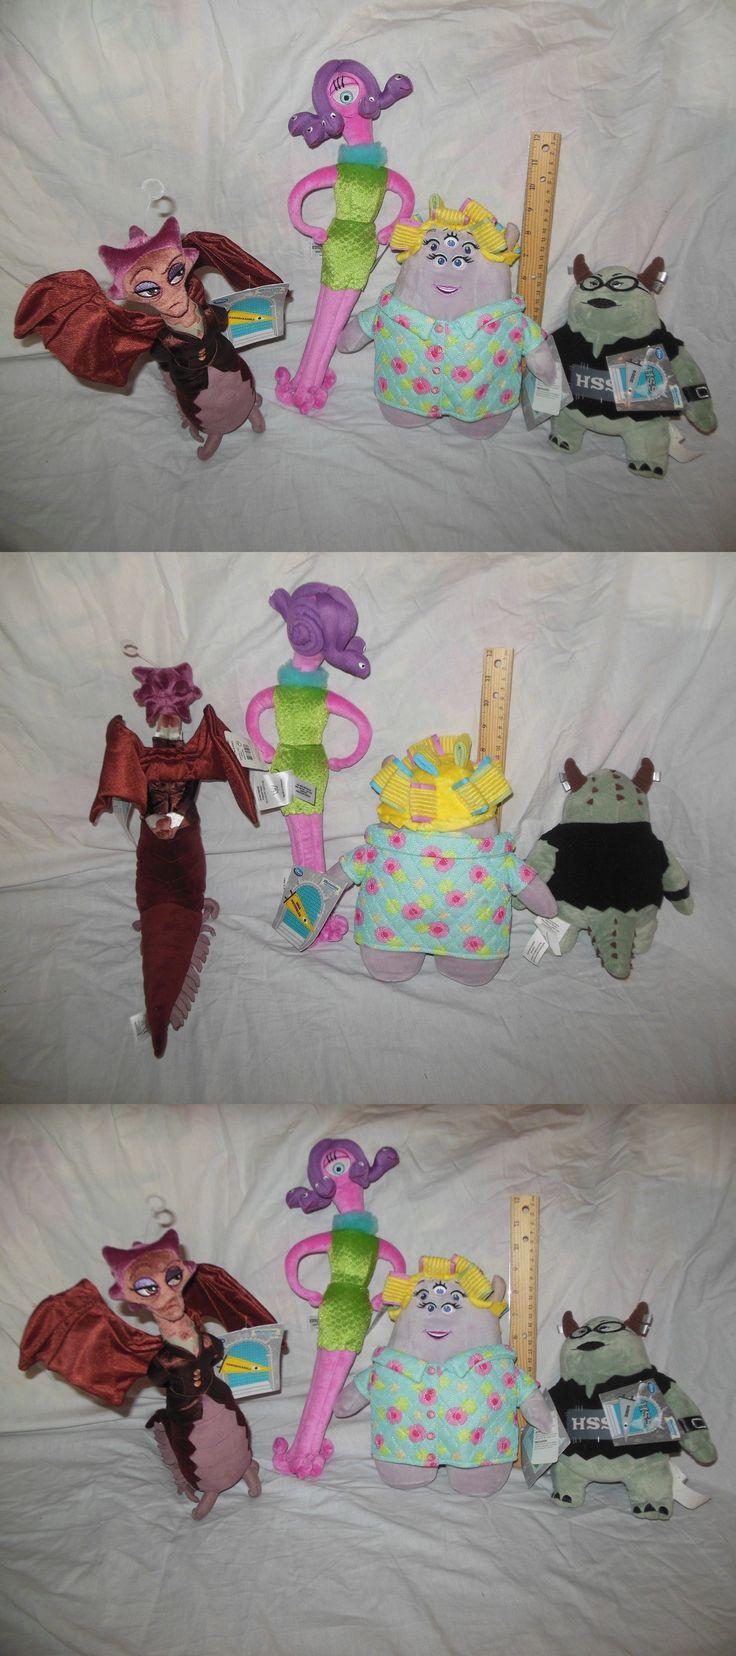 Monsters Inc 44038: Girls Monsters Inc University 4 Plush Patch Hardscrabble Rosie Squibbles Celia -> BUY IT NOW ONLY: $35 on eBay!